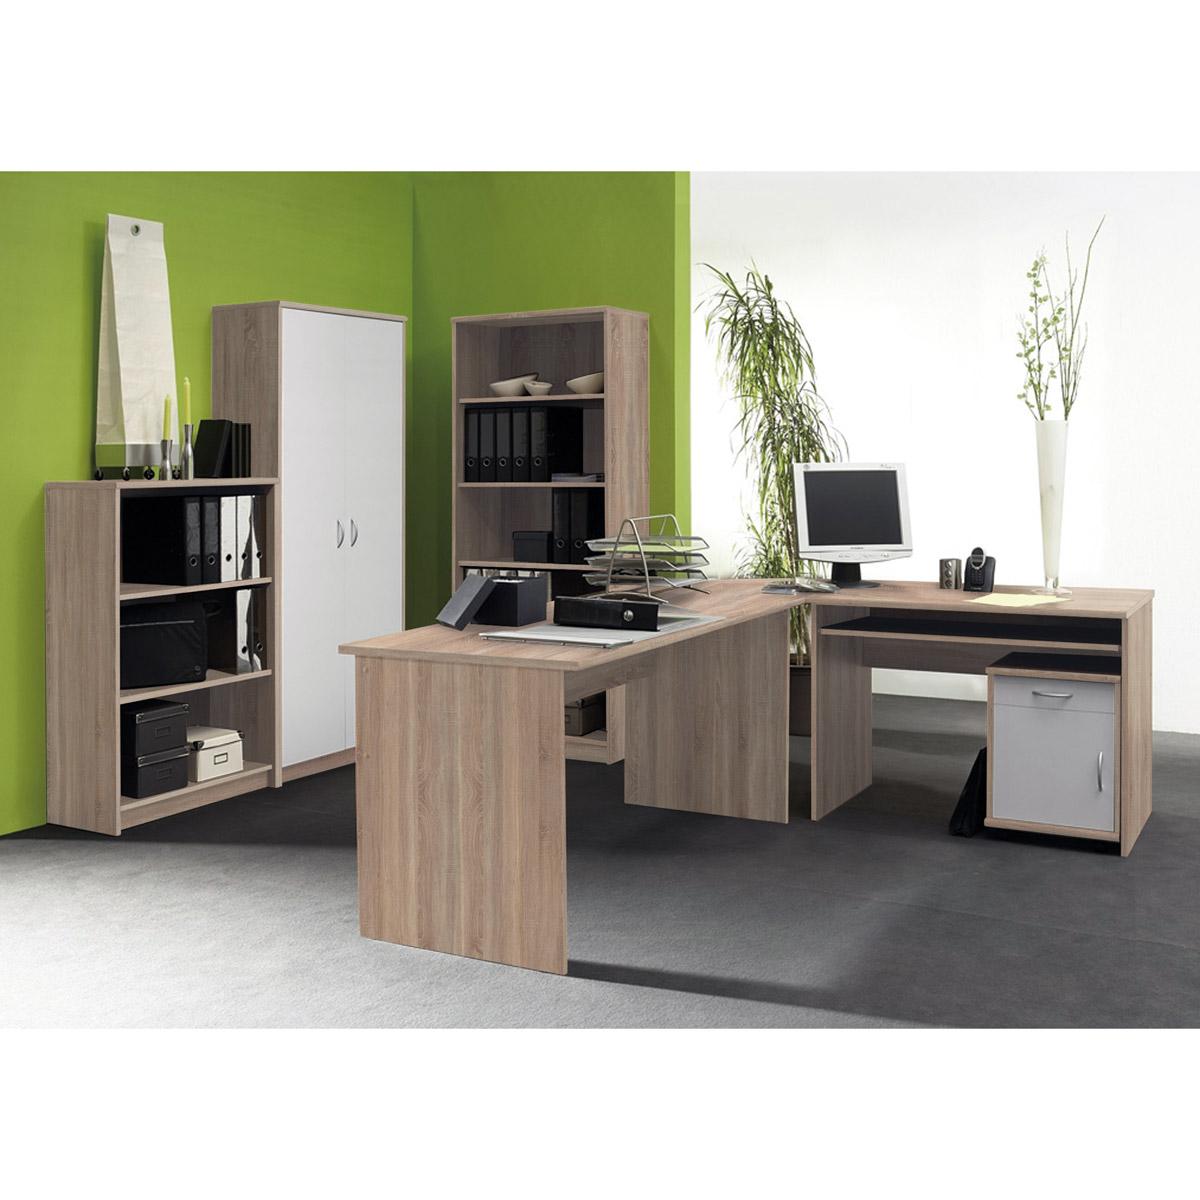 b ro office compact komplettset in walnuss sonoma eiche betonoptik wei 5 teilig ebay. Black Bedroom Furniture Sets. Home Design Ideas